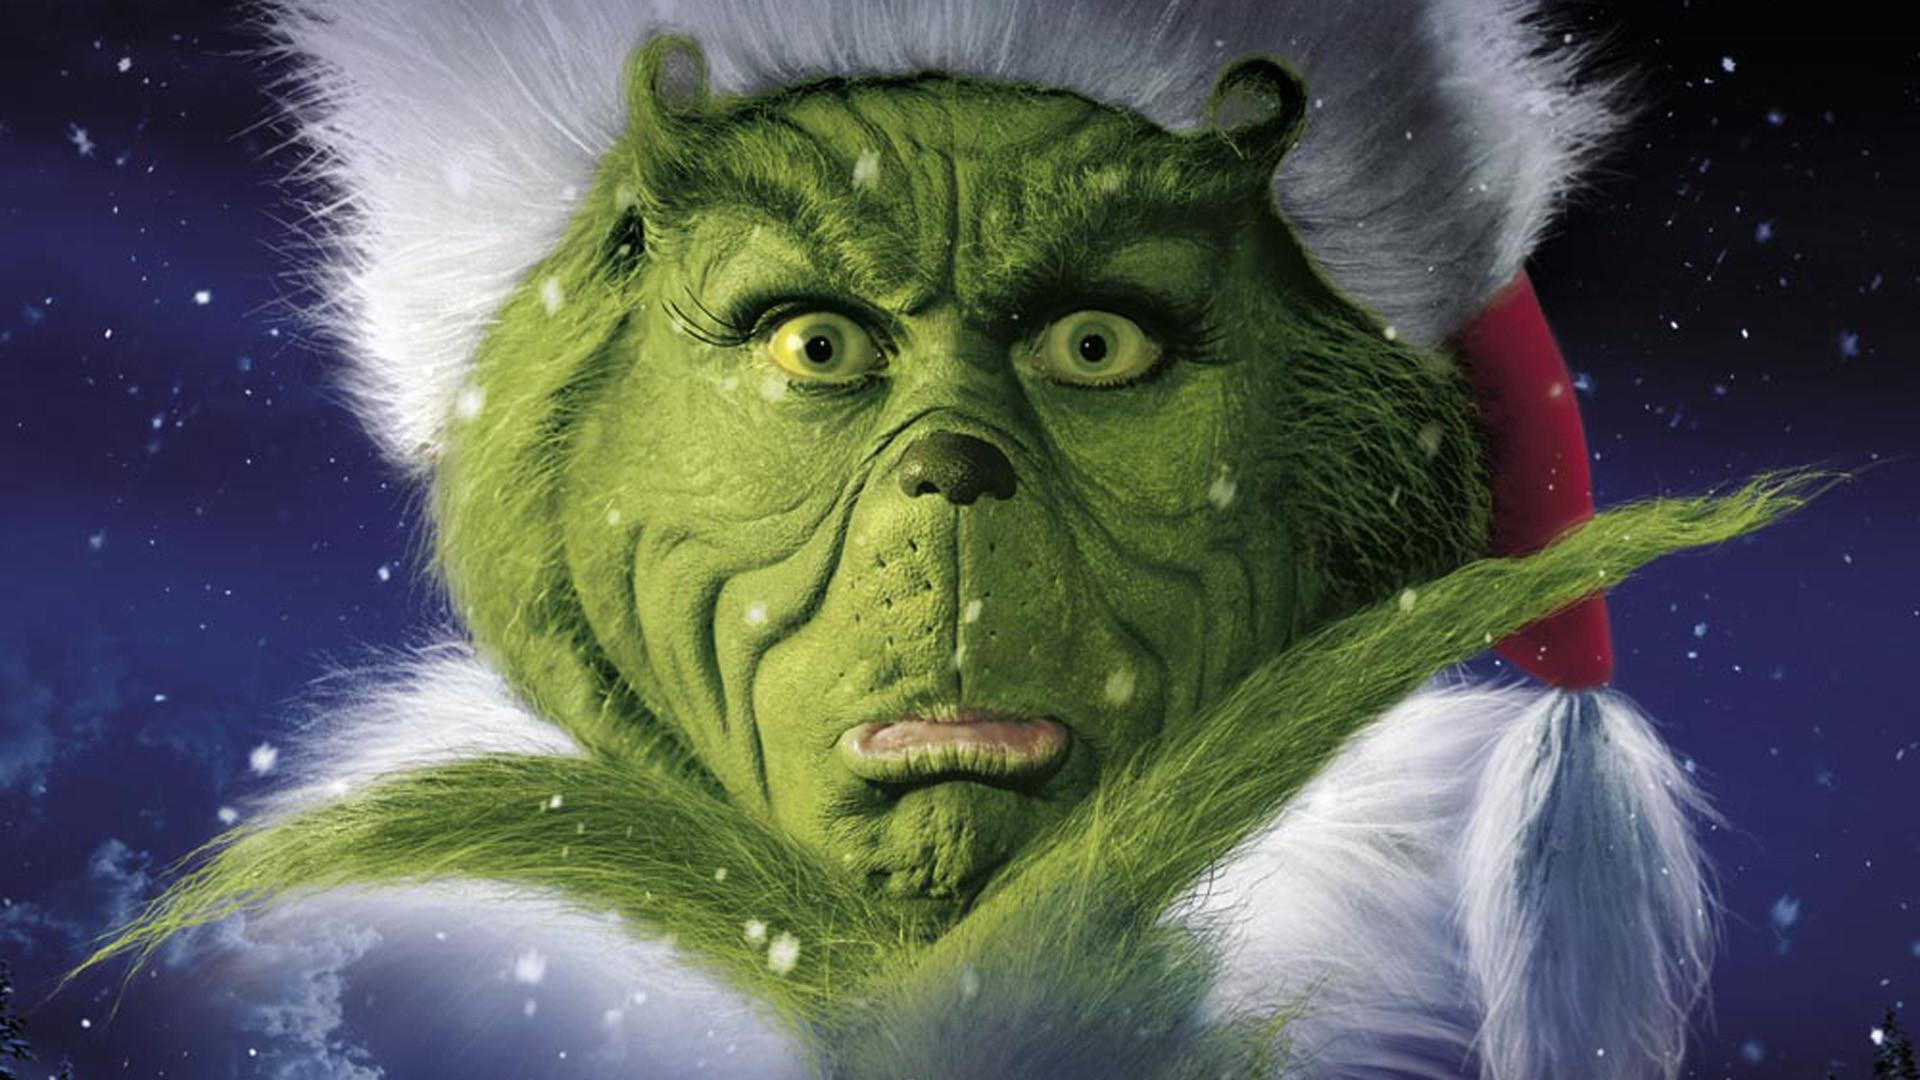 The Grinch Portrait Christmas Wallpaper